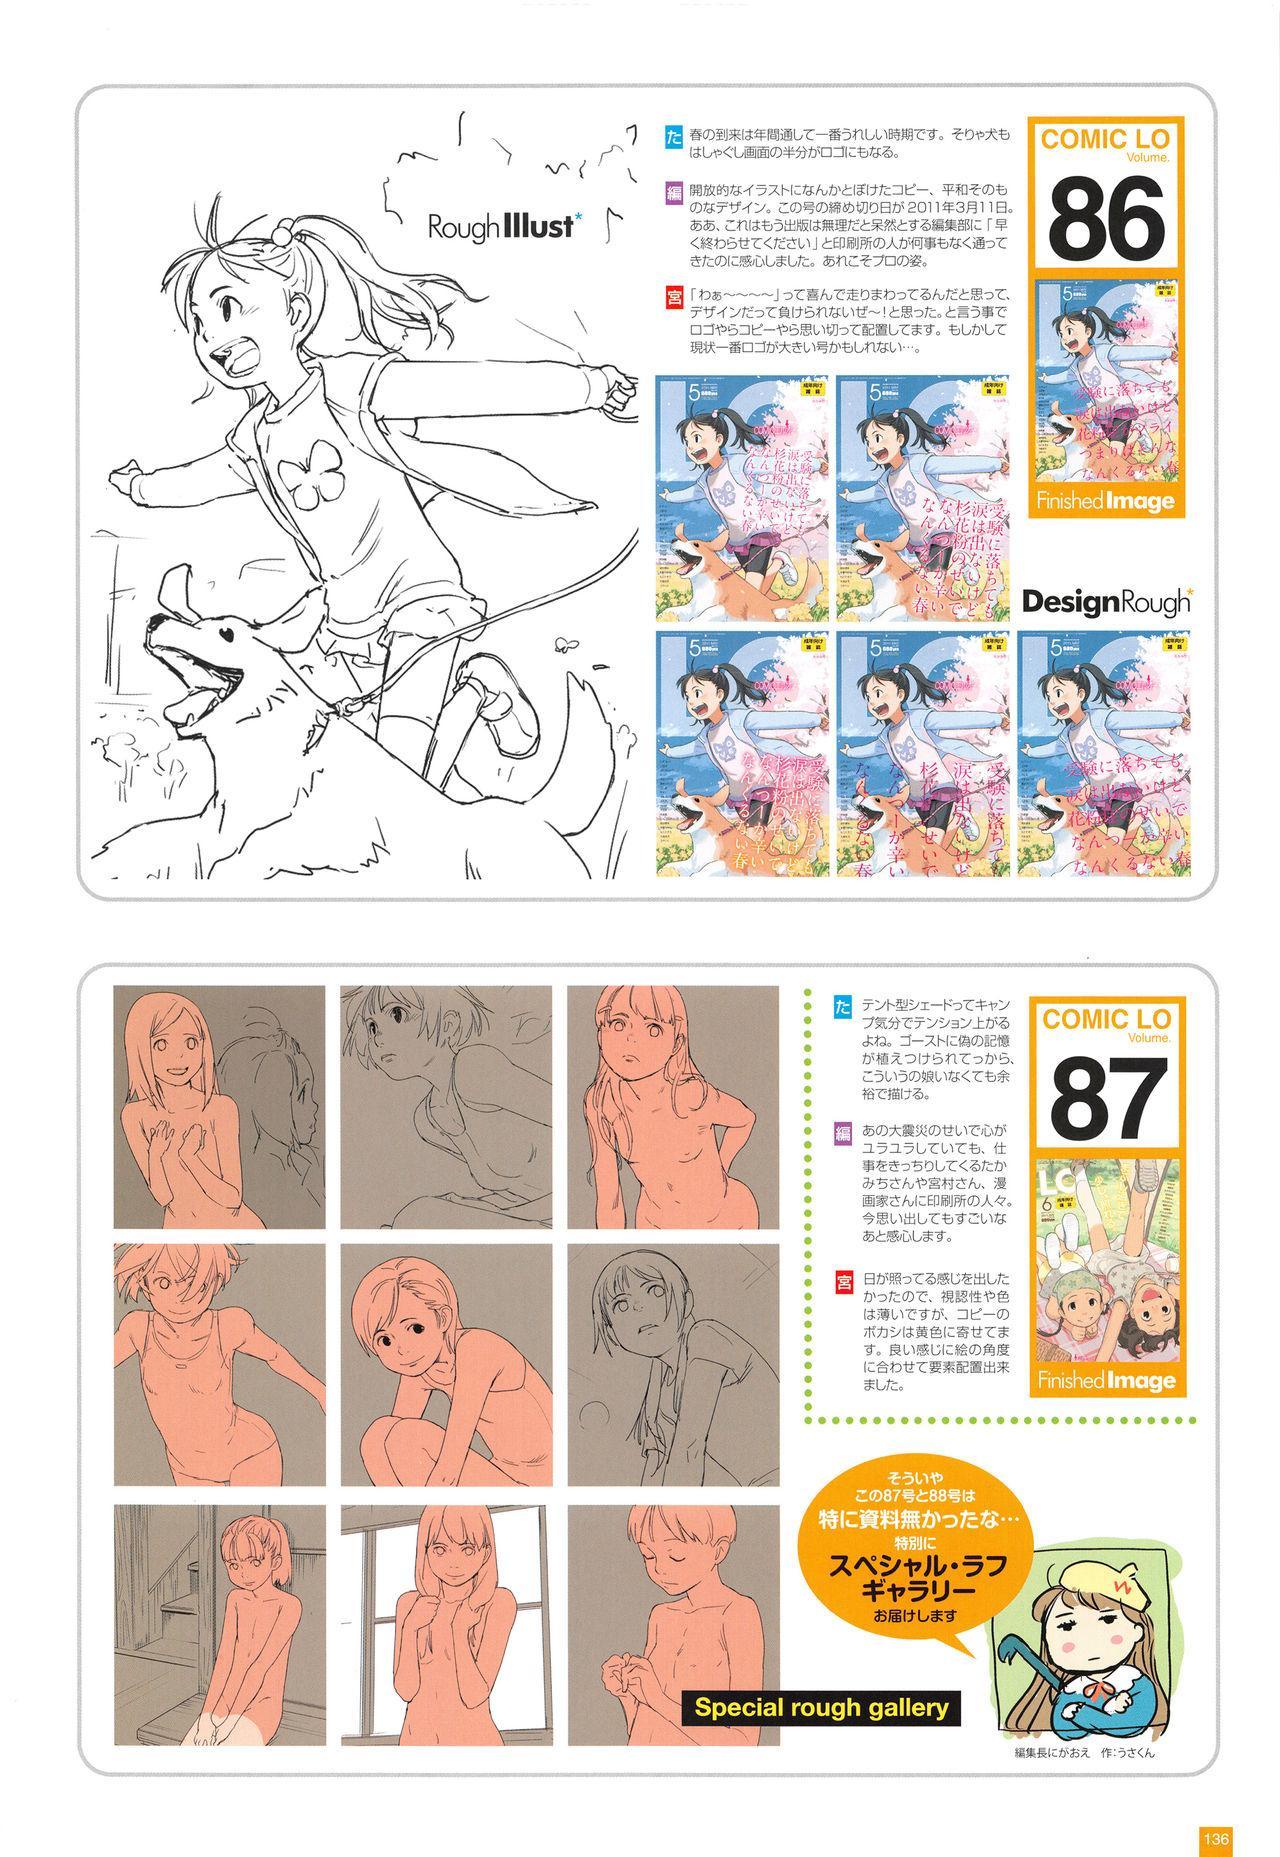 LO Artbook 2-A TAKAMICHI LOOP WORKS 138